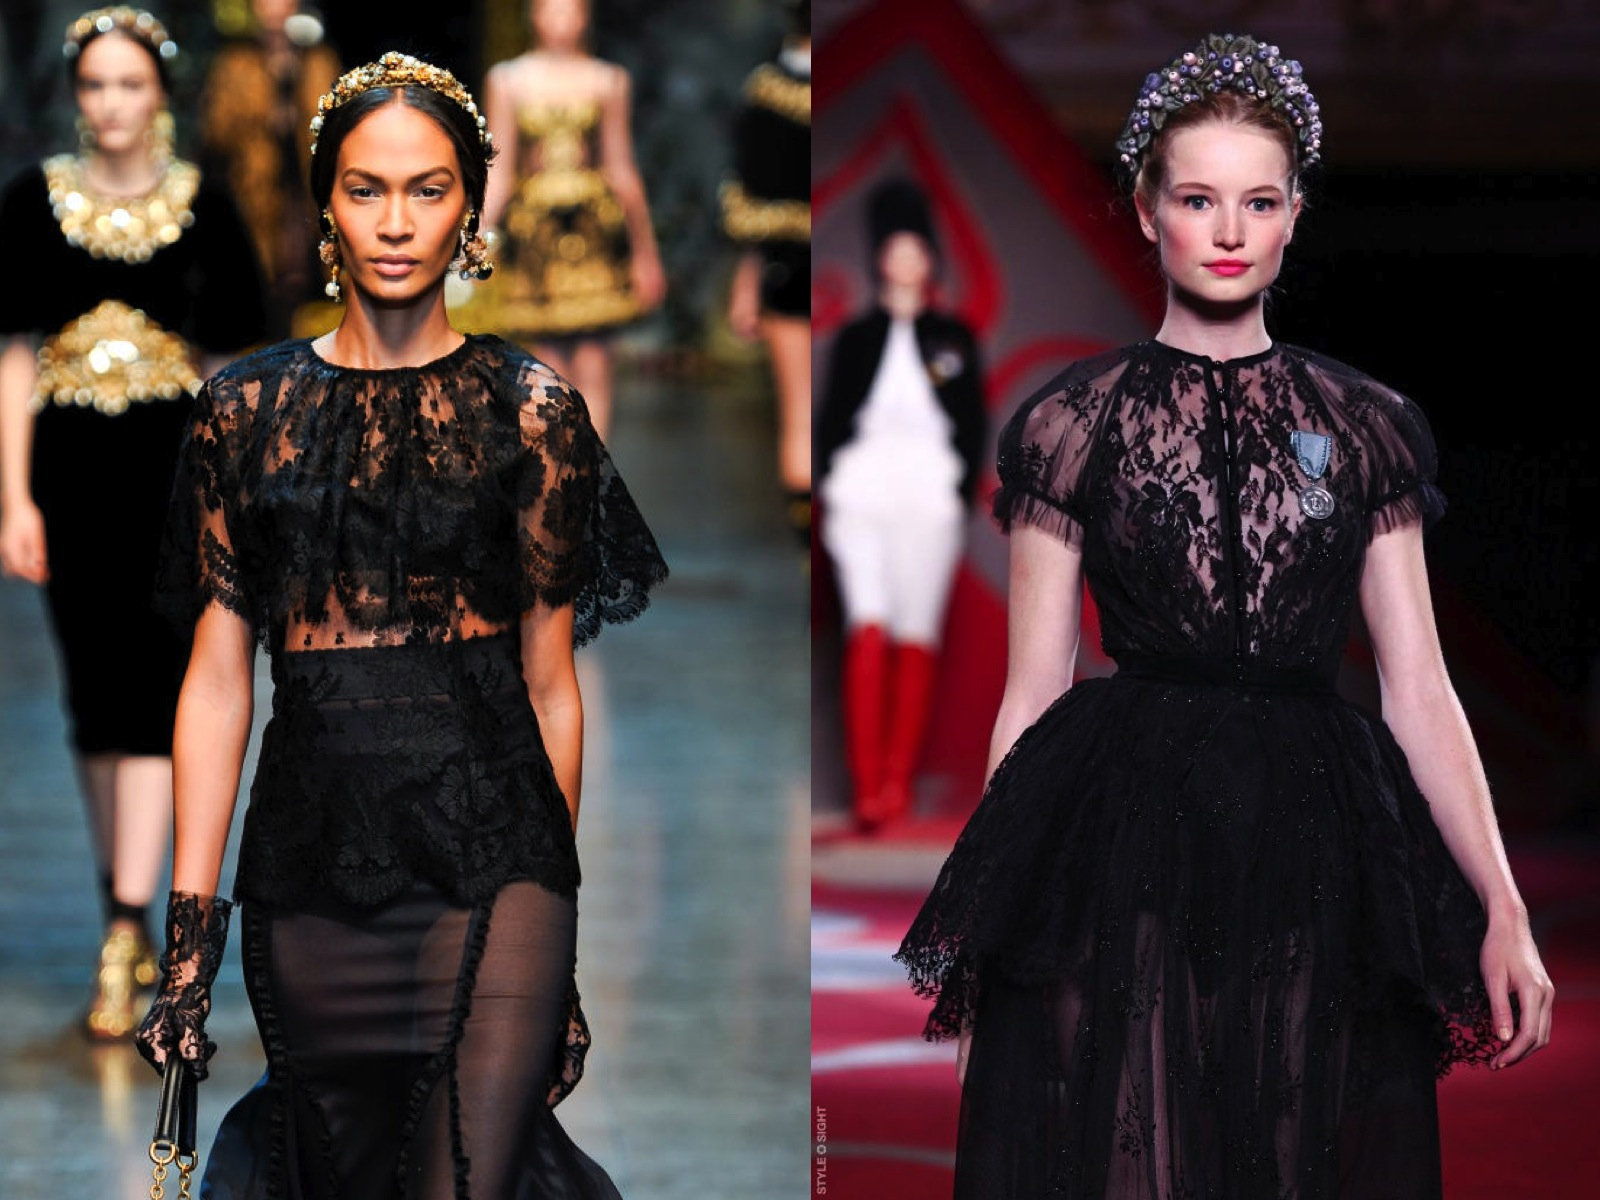 7a6c3e27a3 INSPIRATION Dolce Gabbana FW2012  13... Ulyana Sergeenko Haute Couture  FW2012  13